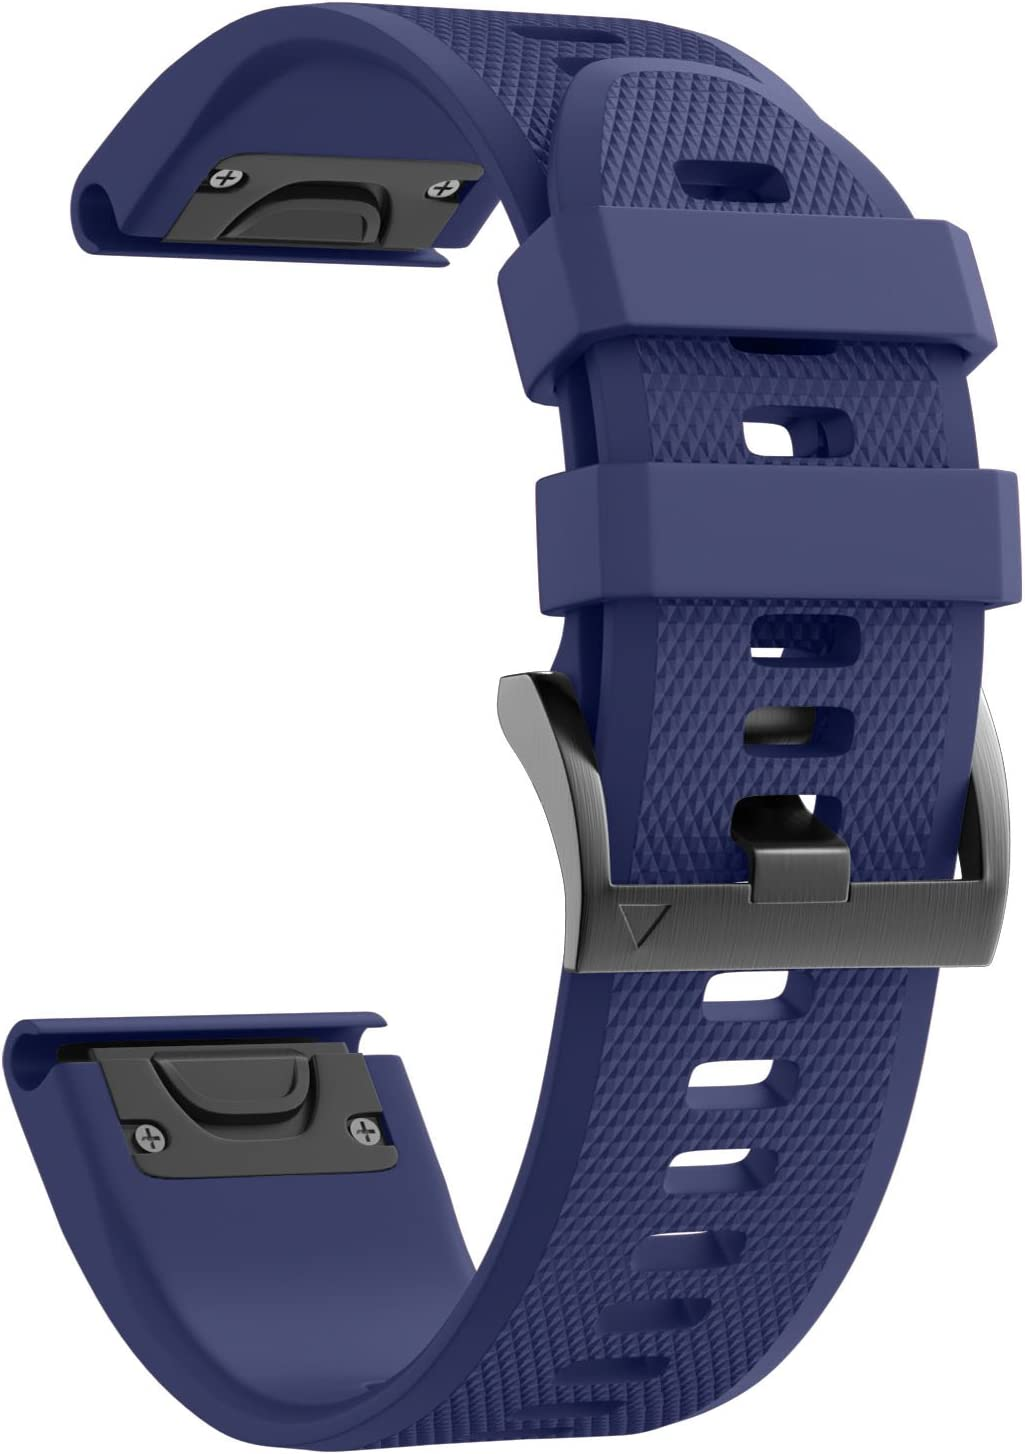 Malla azul Para Reloj Garmin Fenix 5/5 plus/6/6 pro  22 mm